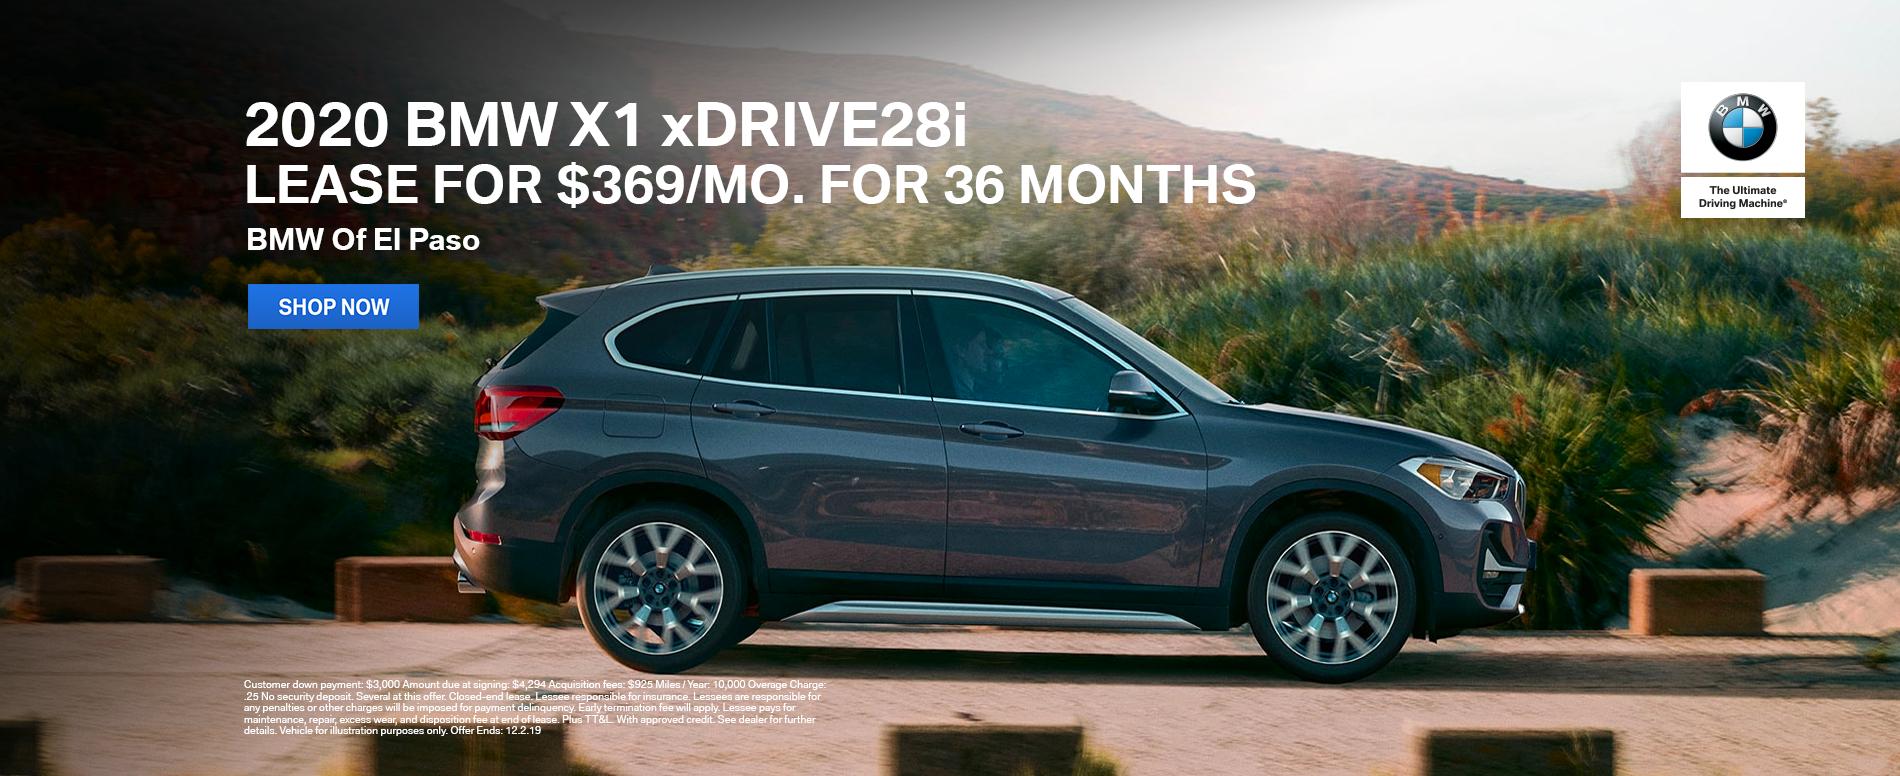 2020 BMW X1 xDrive28i Lease El Paso